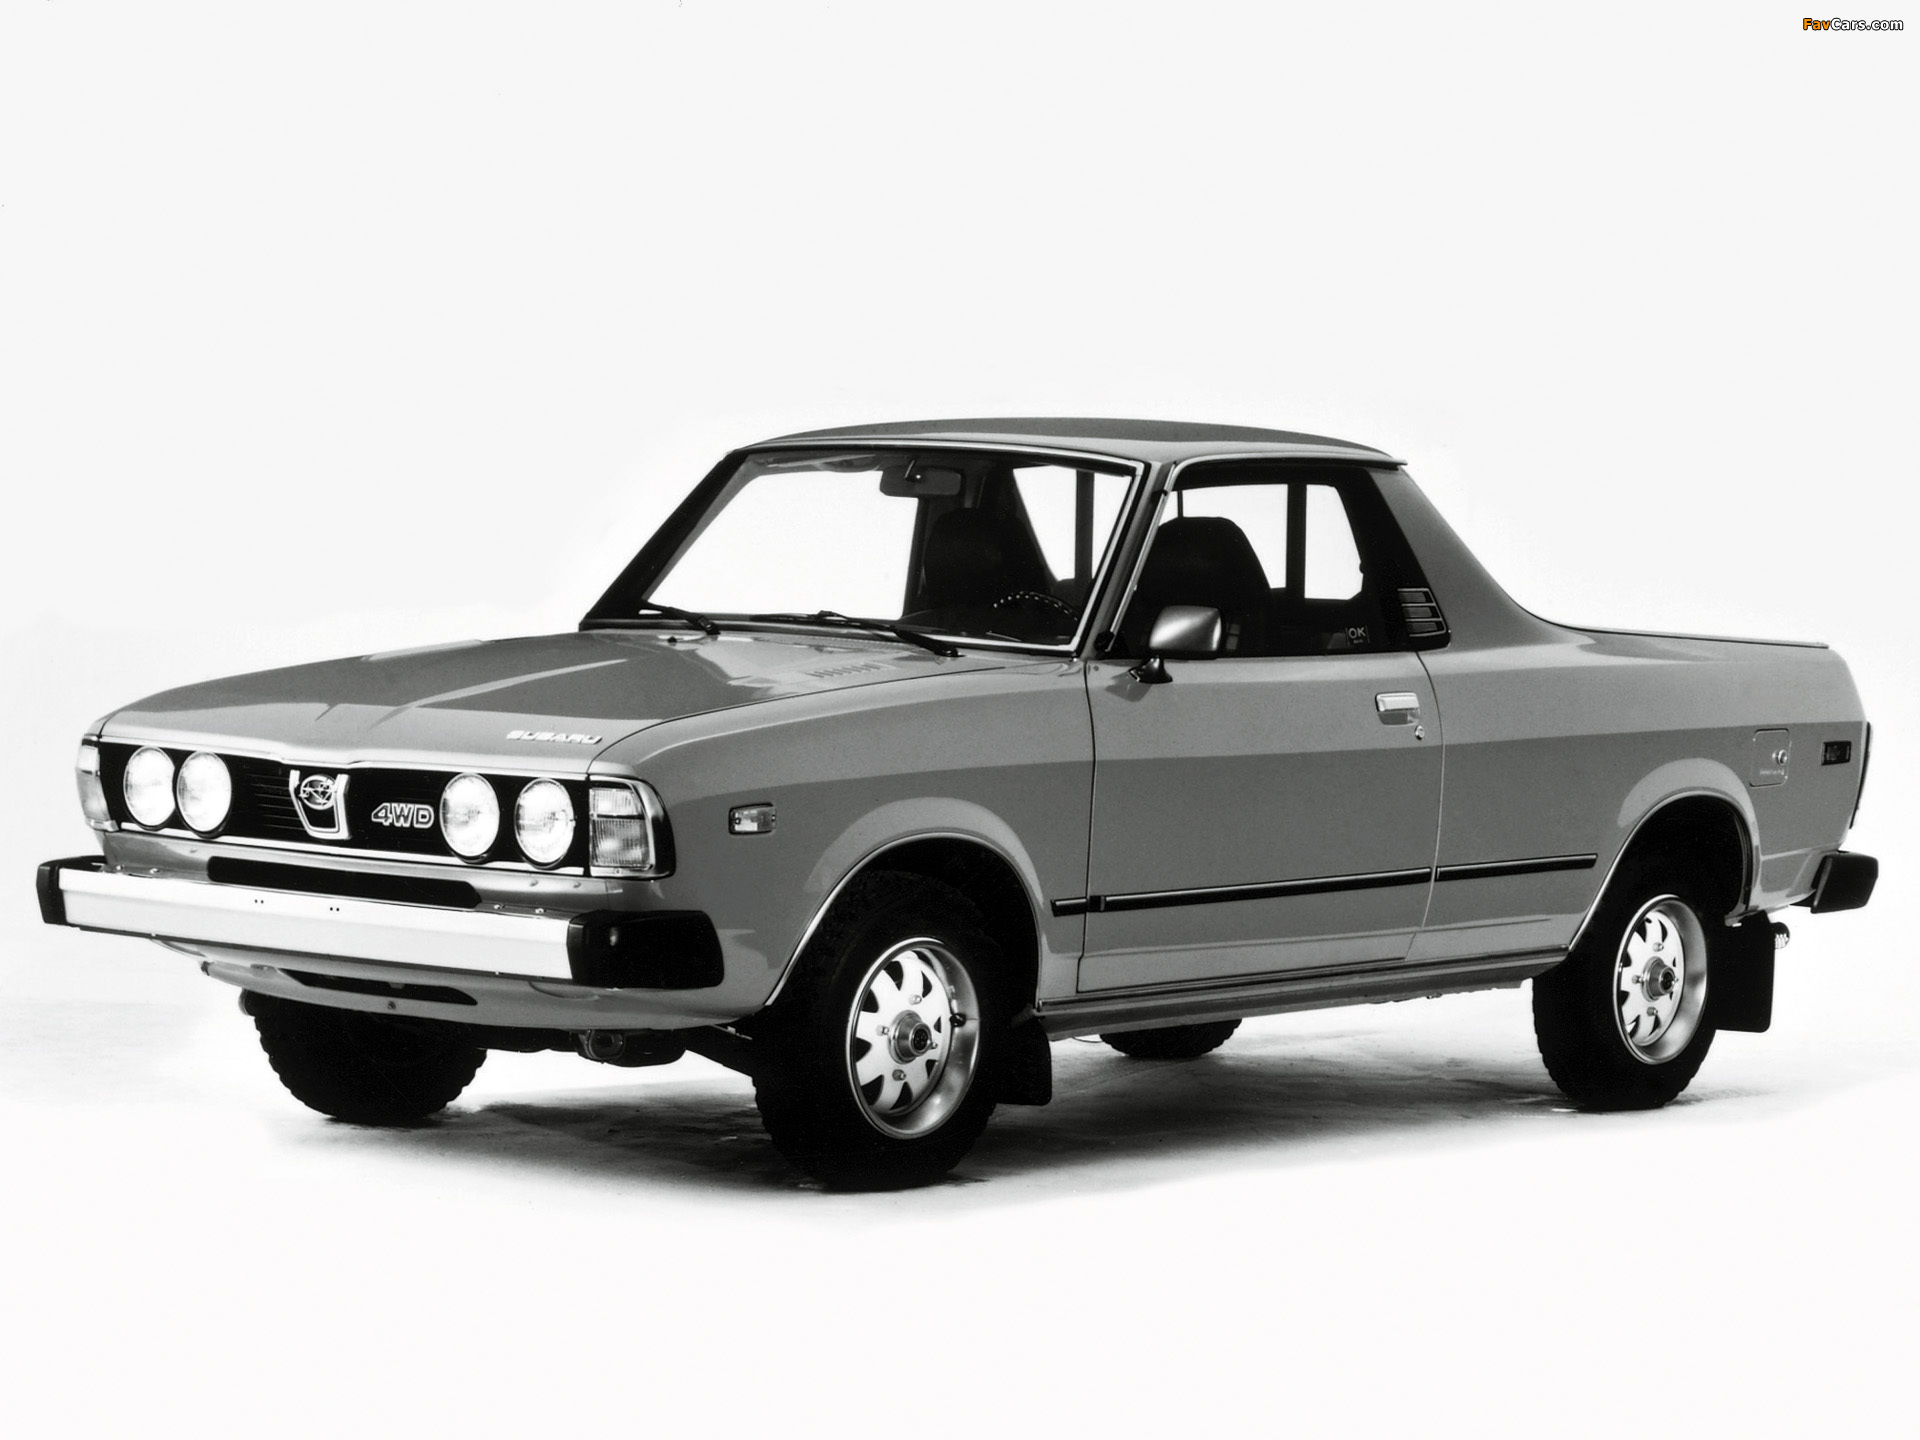 1977 Subaru Brat I want one 4x4